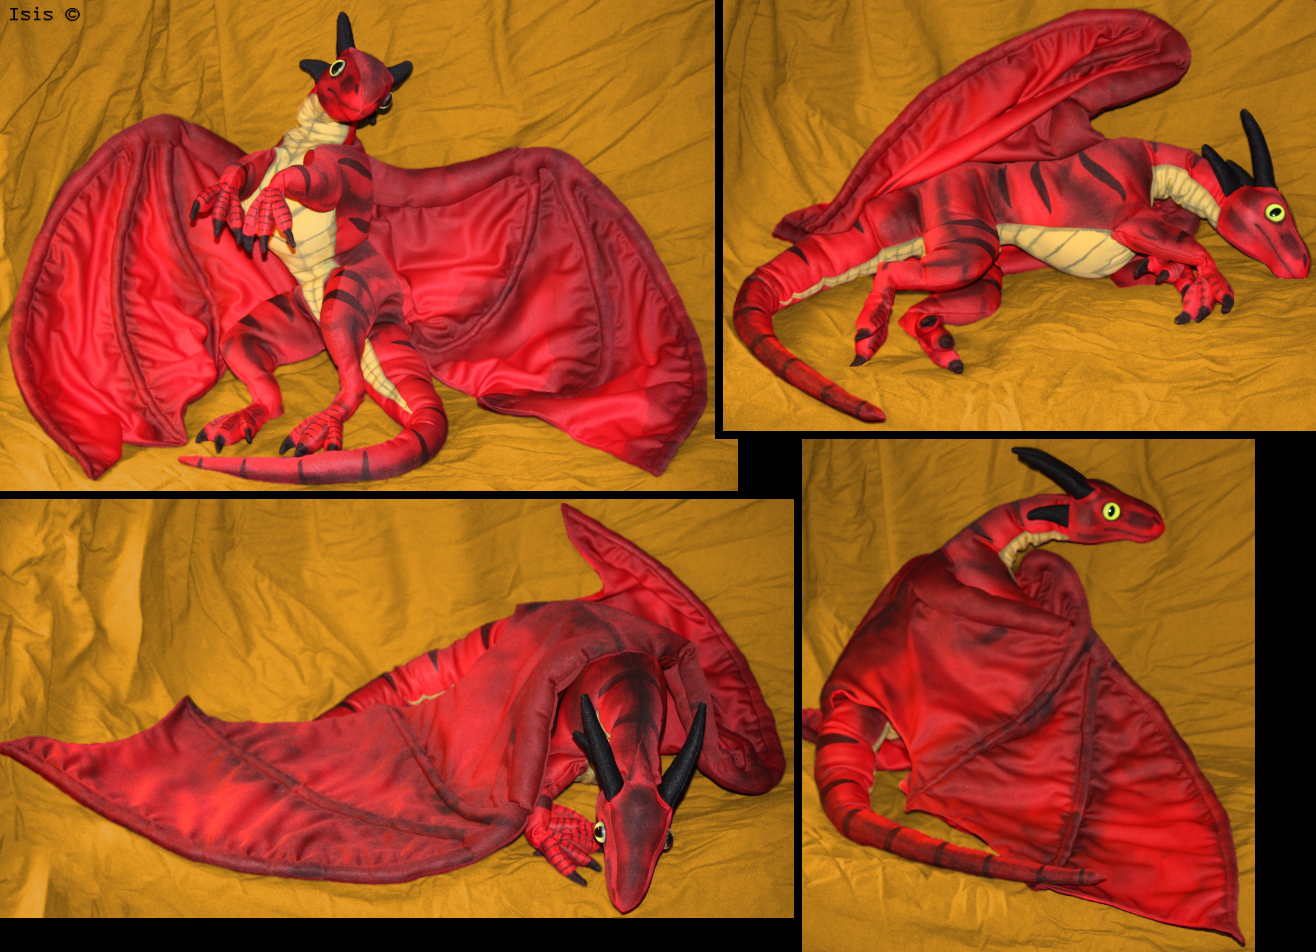 Red dragon-plushie by IsisMasshiro